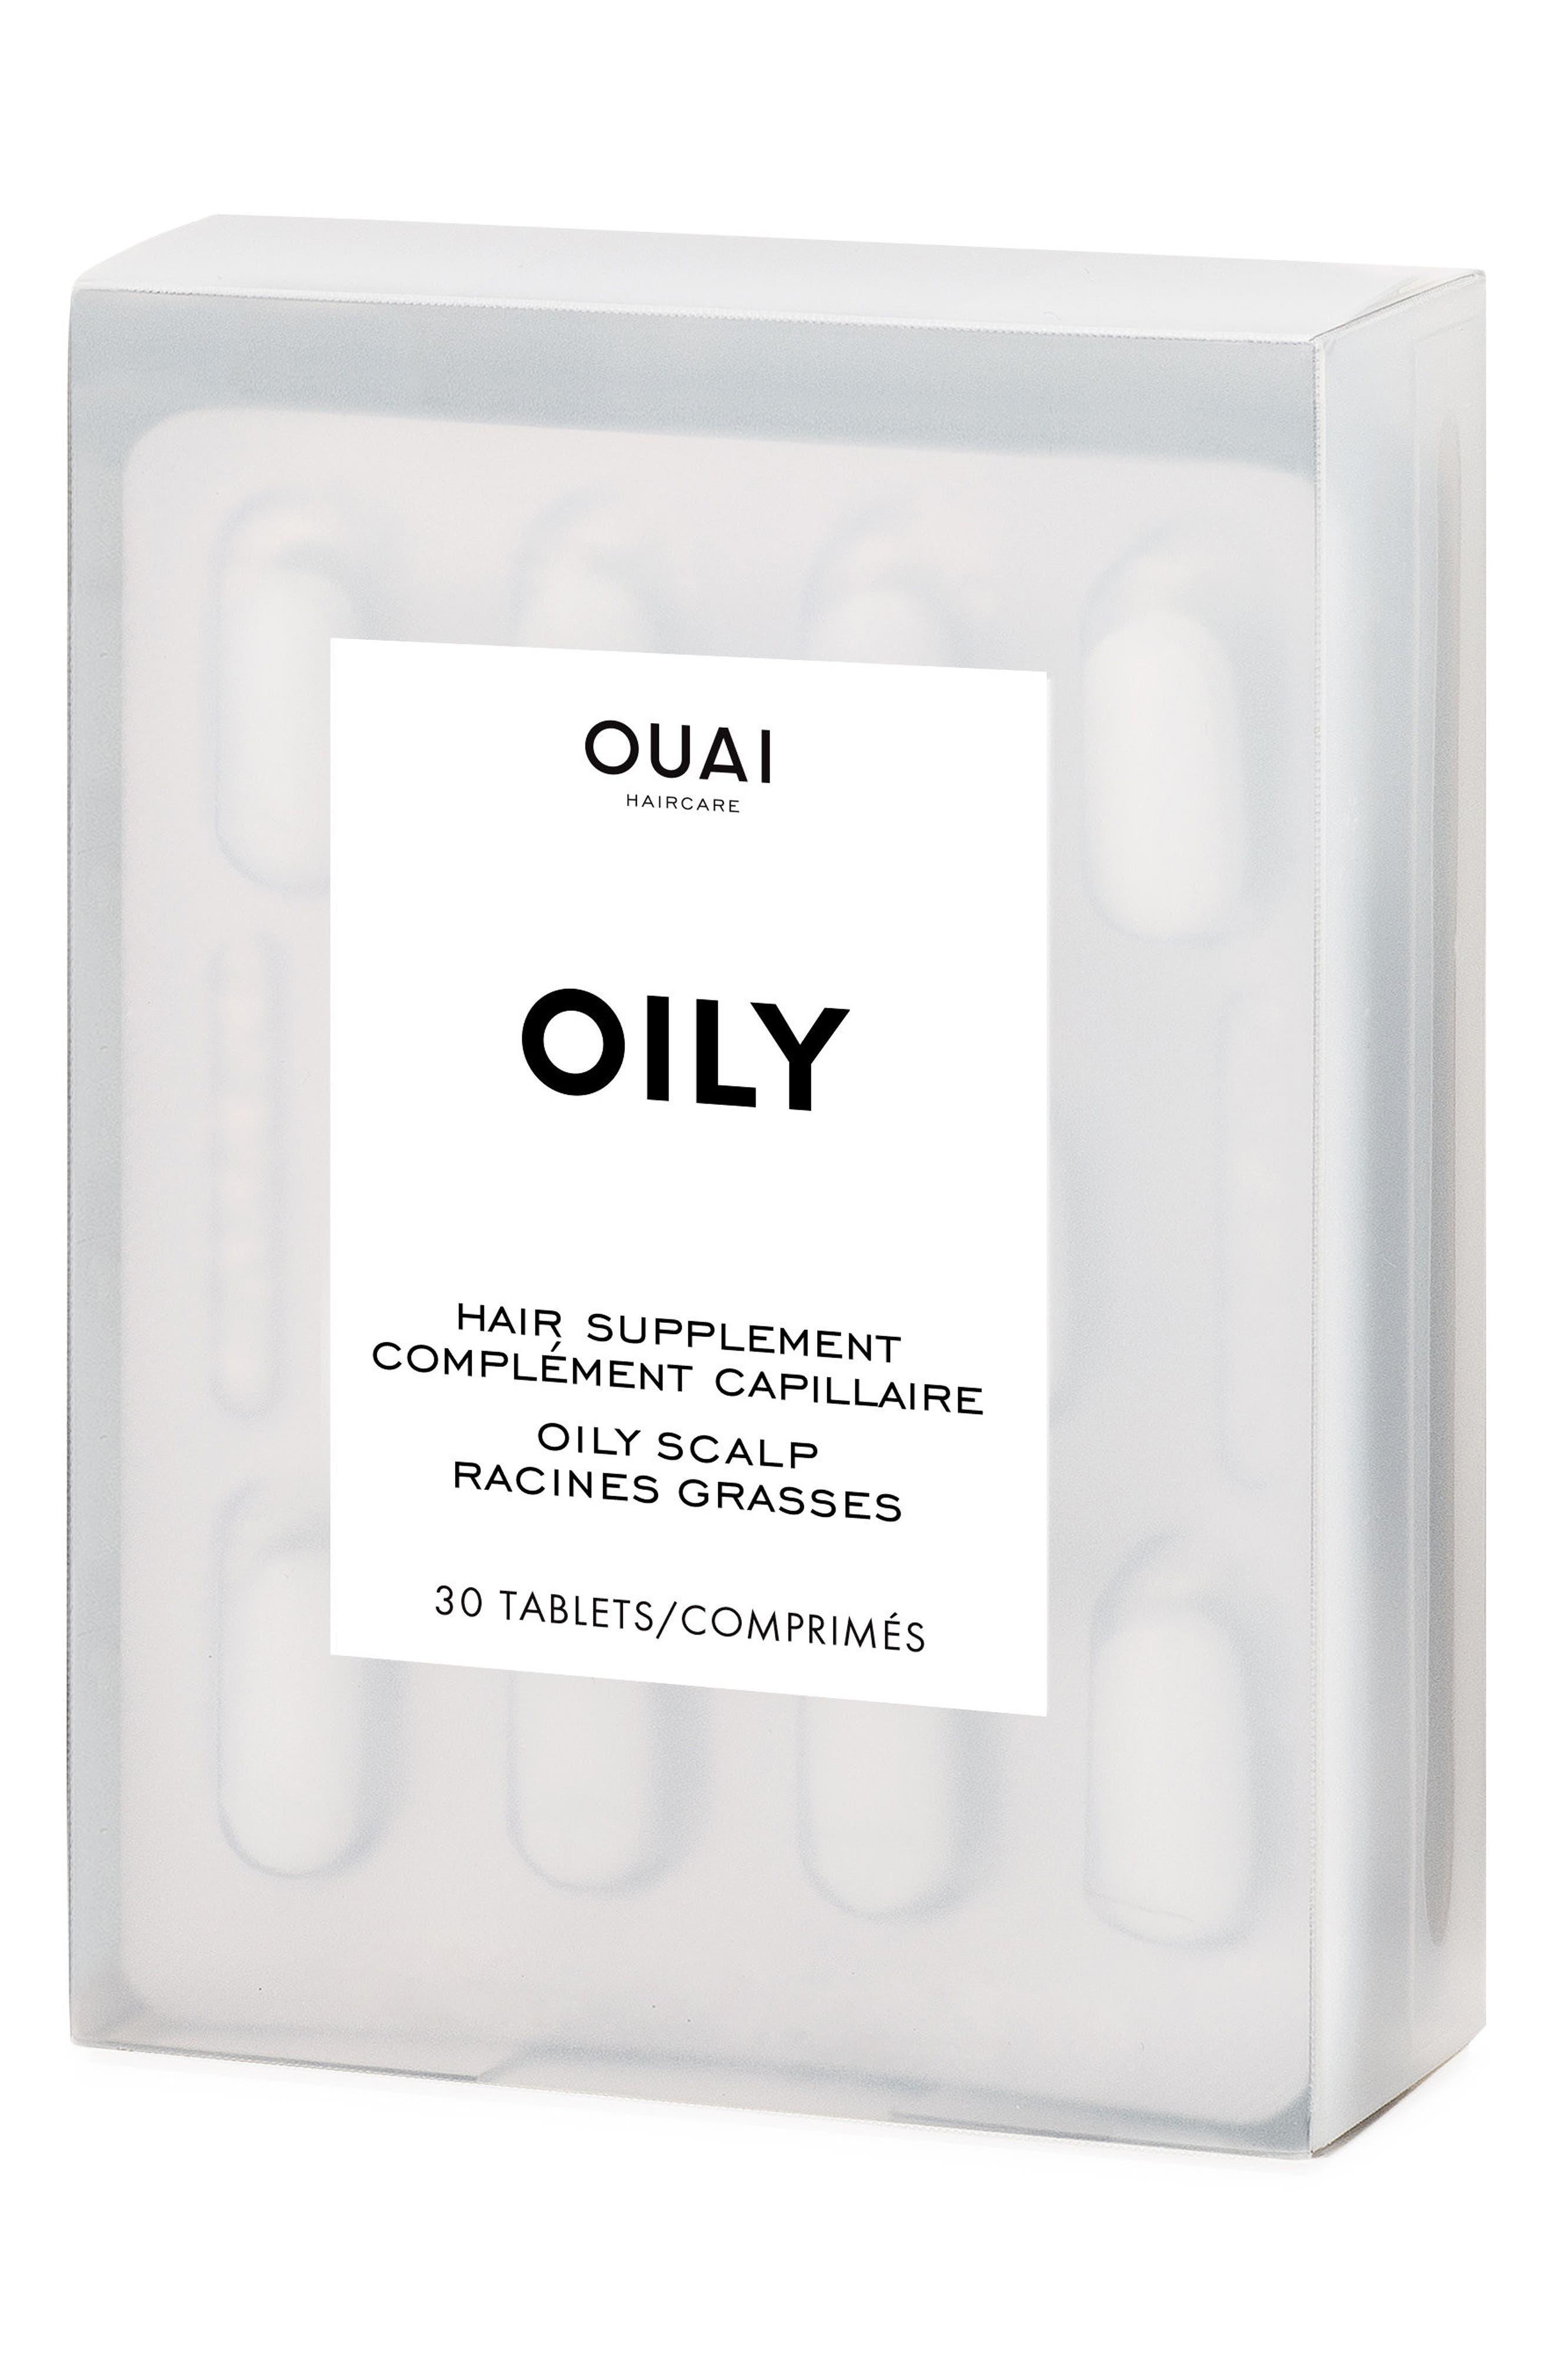 OUAI Oily Scalp Supplement